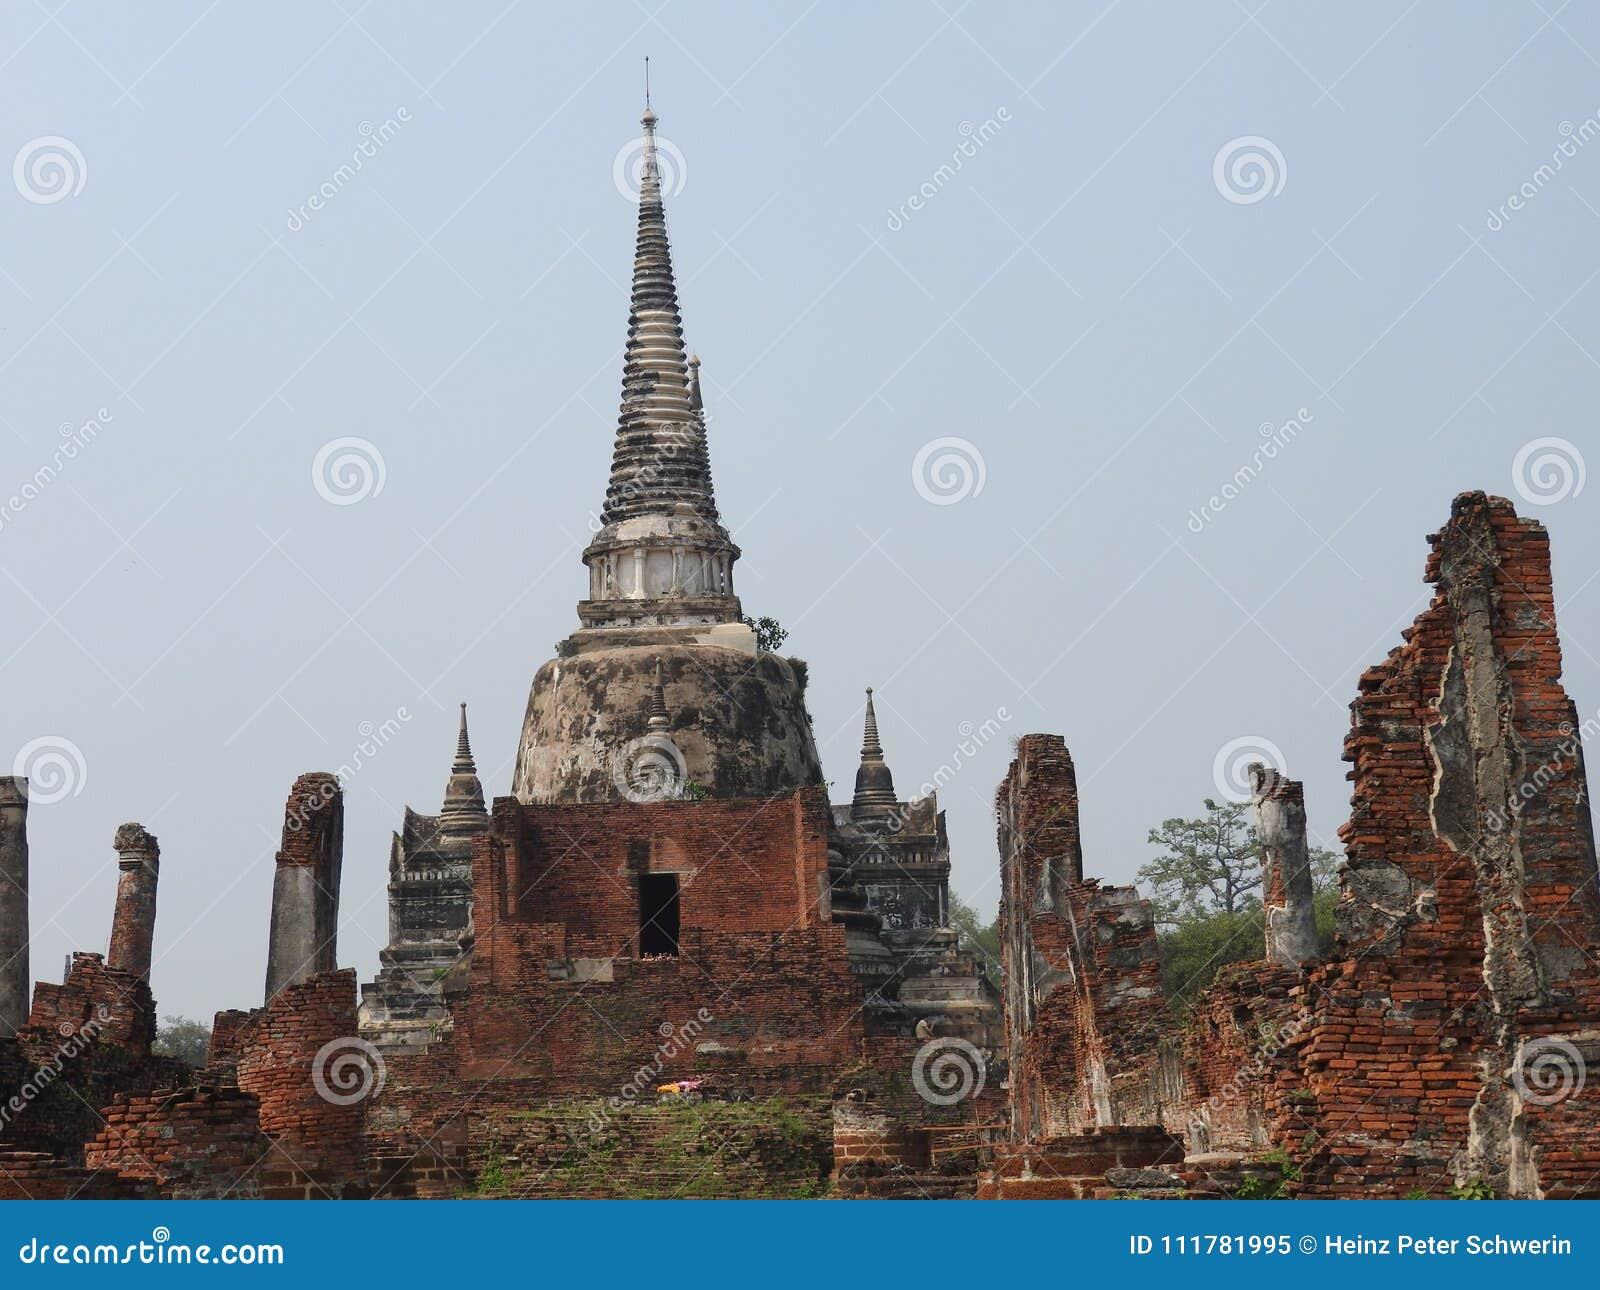 Ayutthaya capital of the Kingdom of Siam